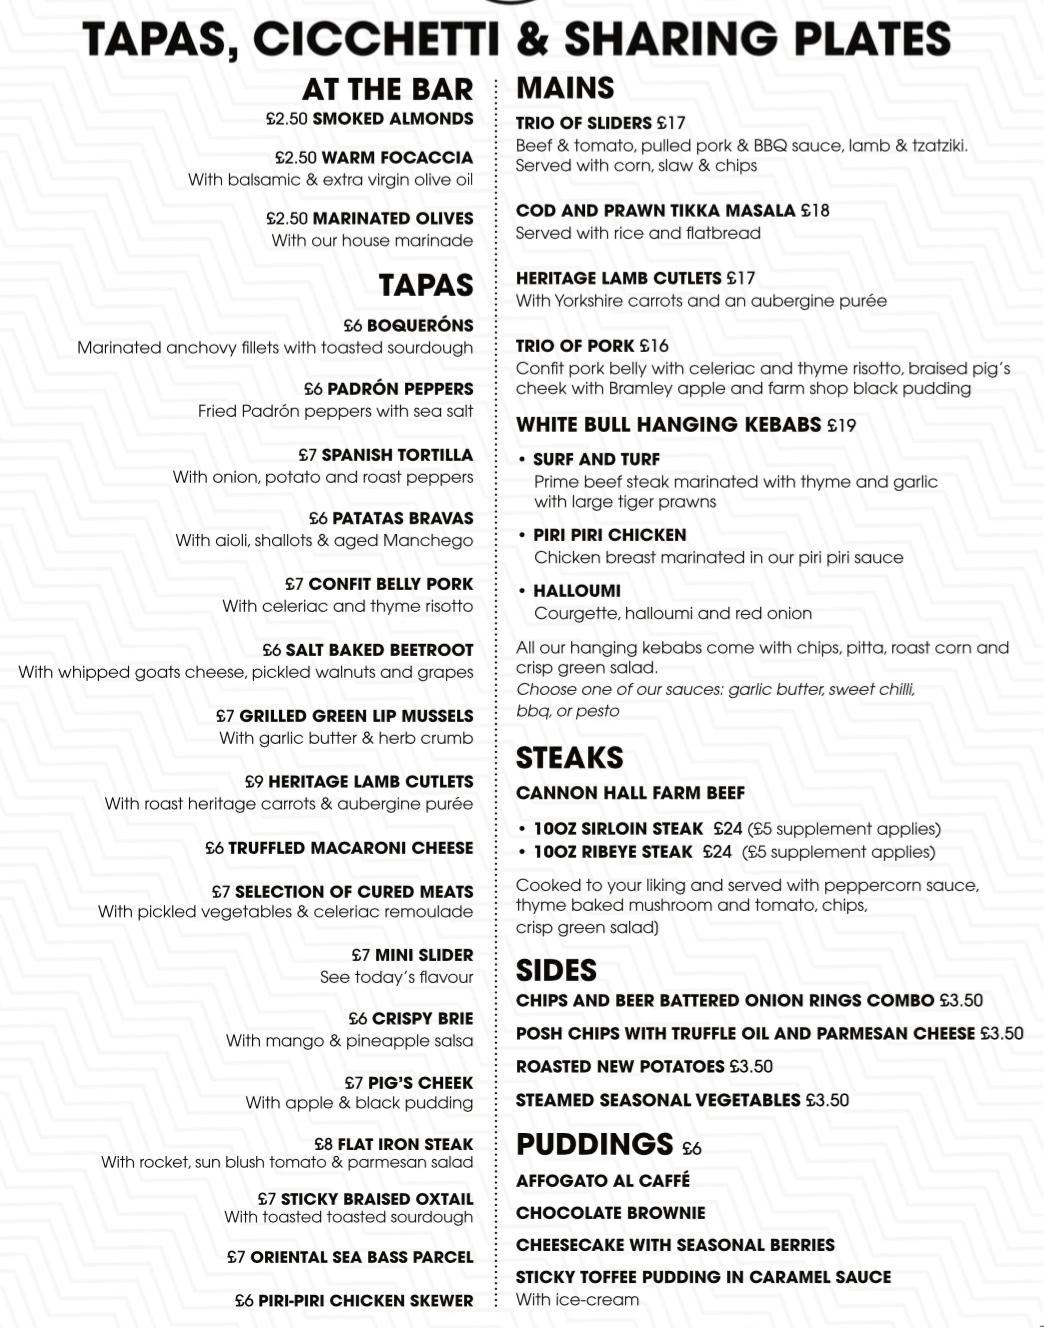 Tapas Feb 2019 menu